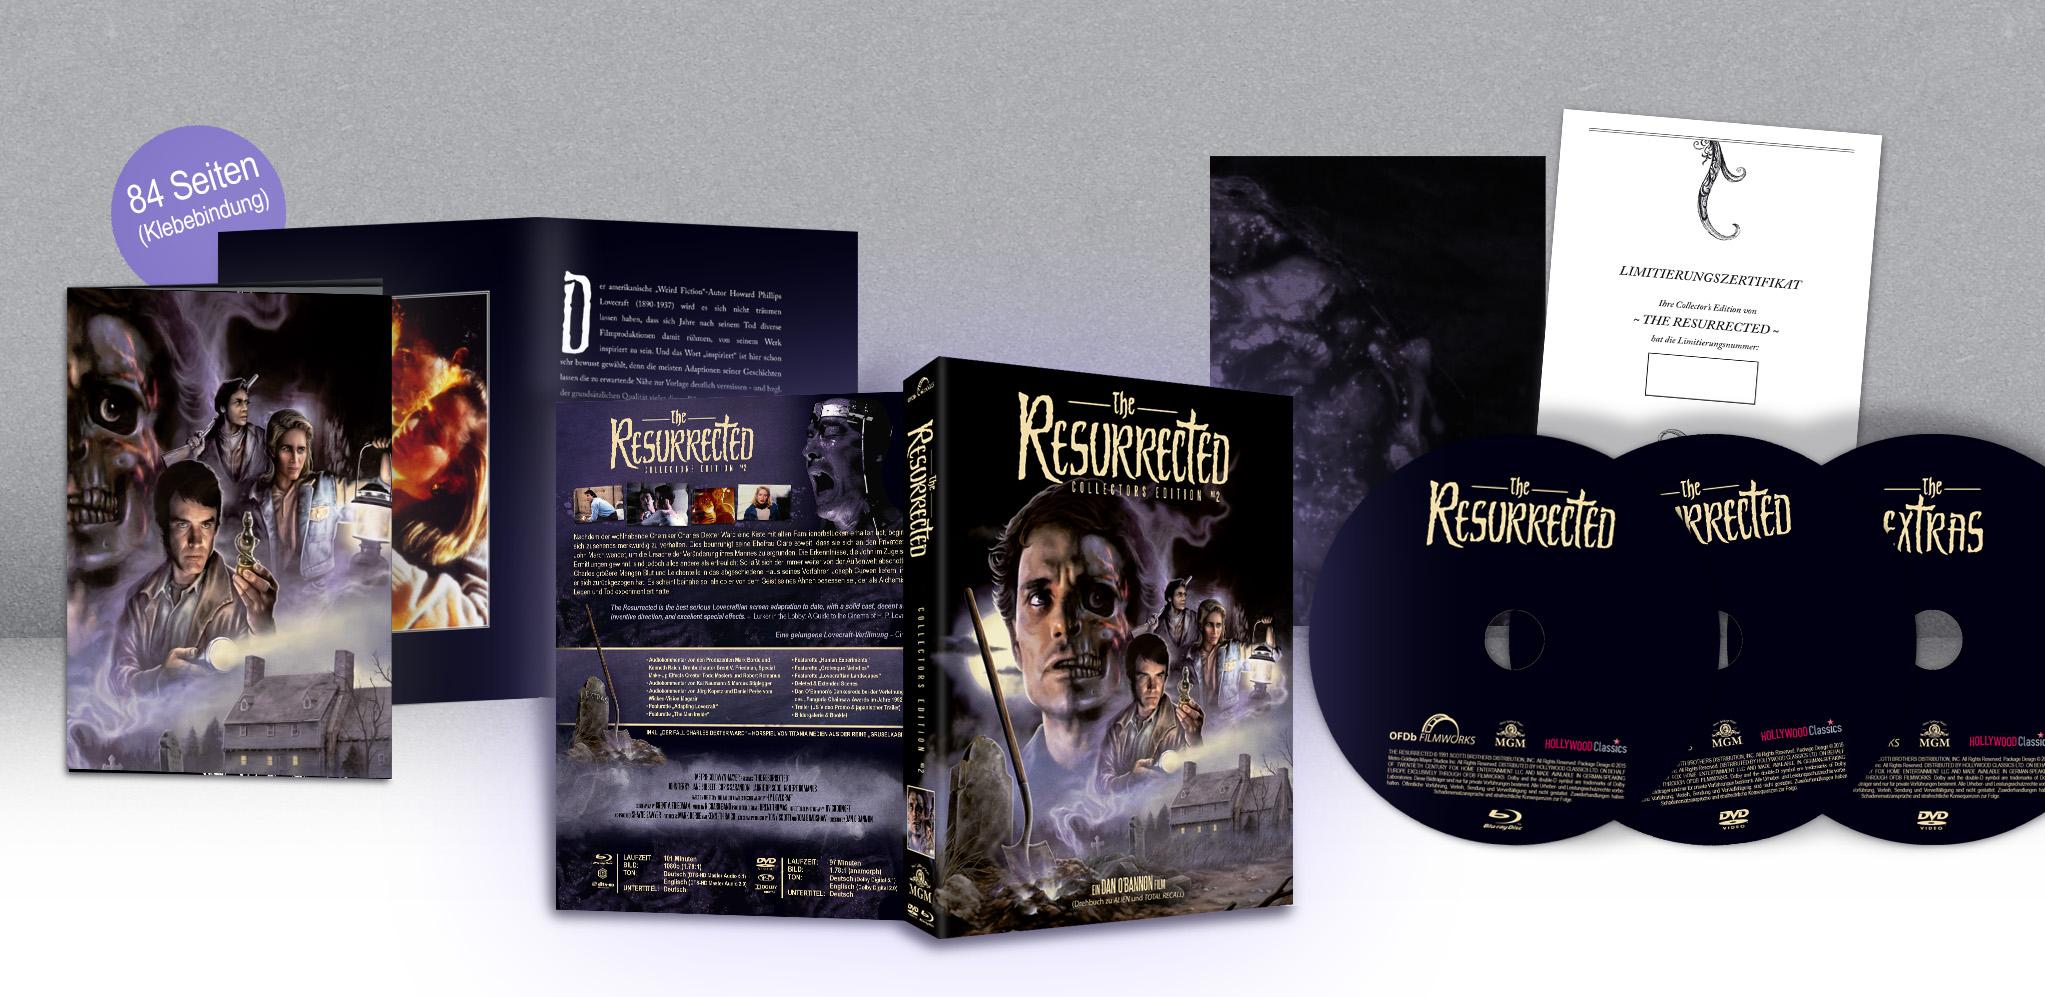 The Resurrected BluRay DVD